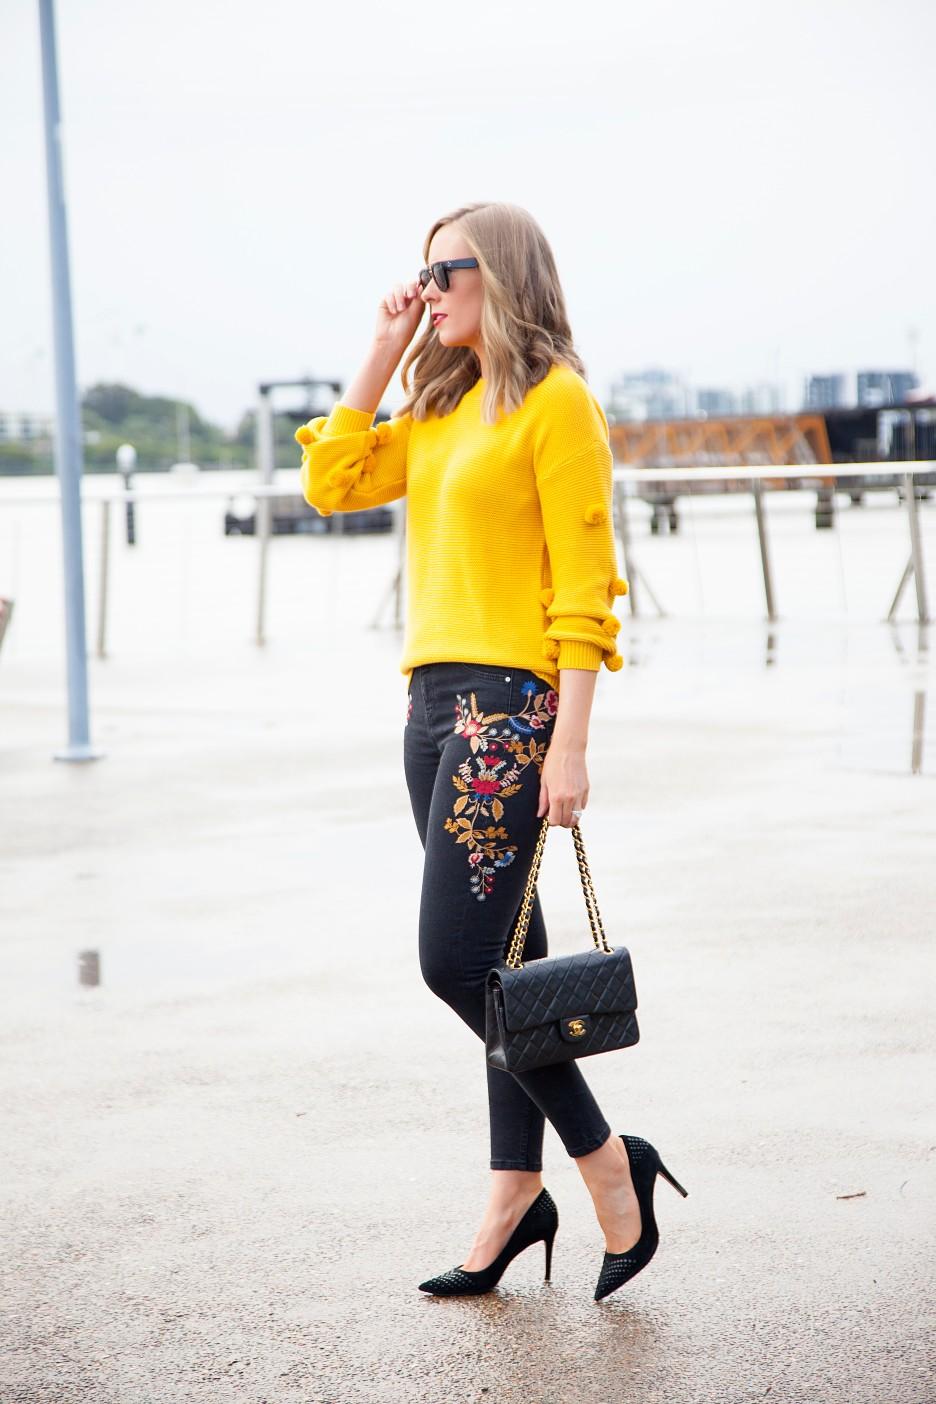 Style-Elixir-Lauren-Slade-marigold-fashion-trend-fashion-style-outfit-ideas-9